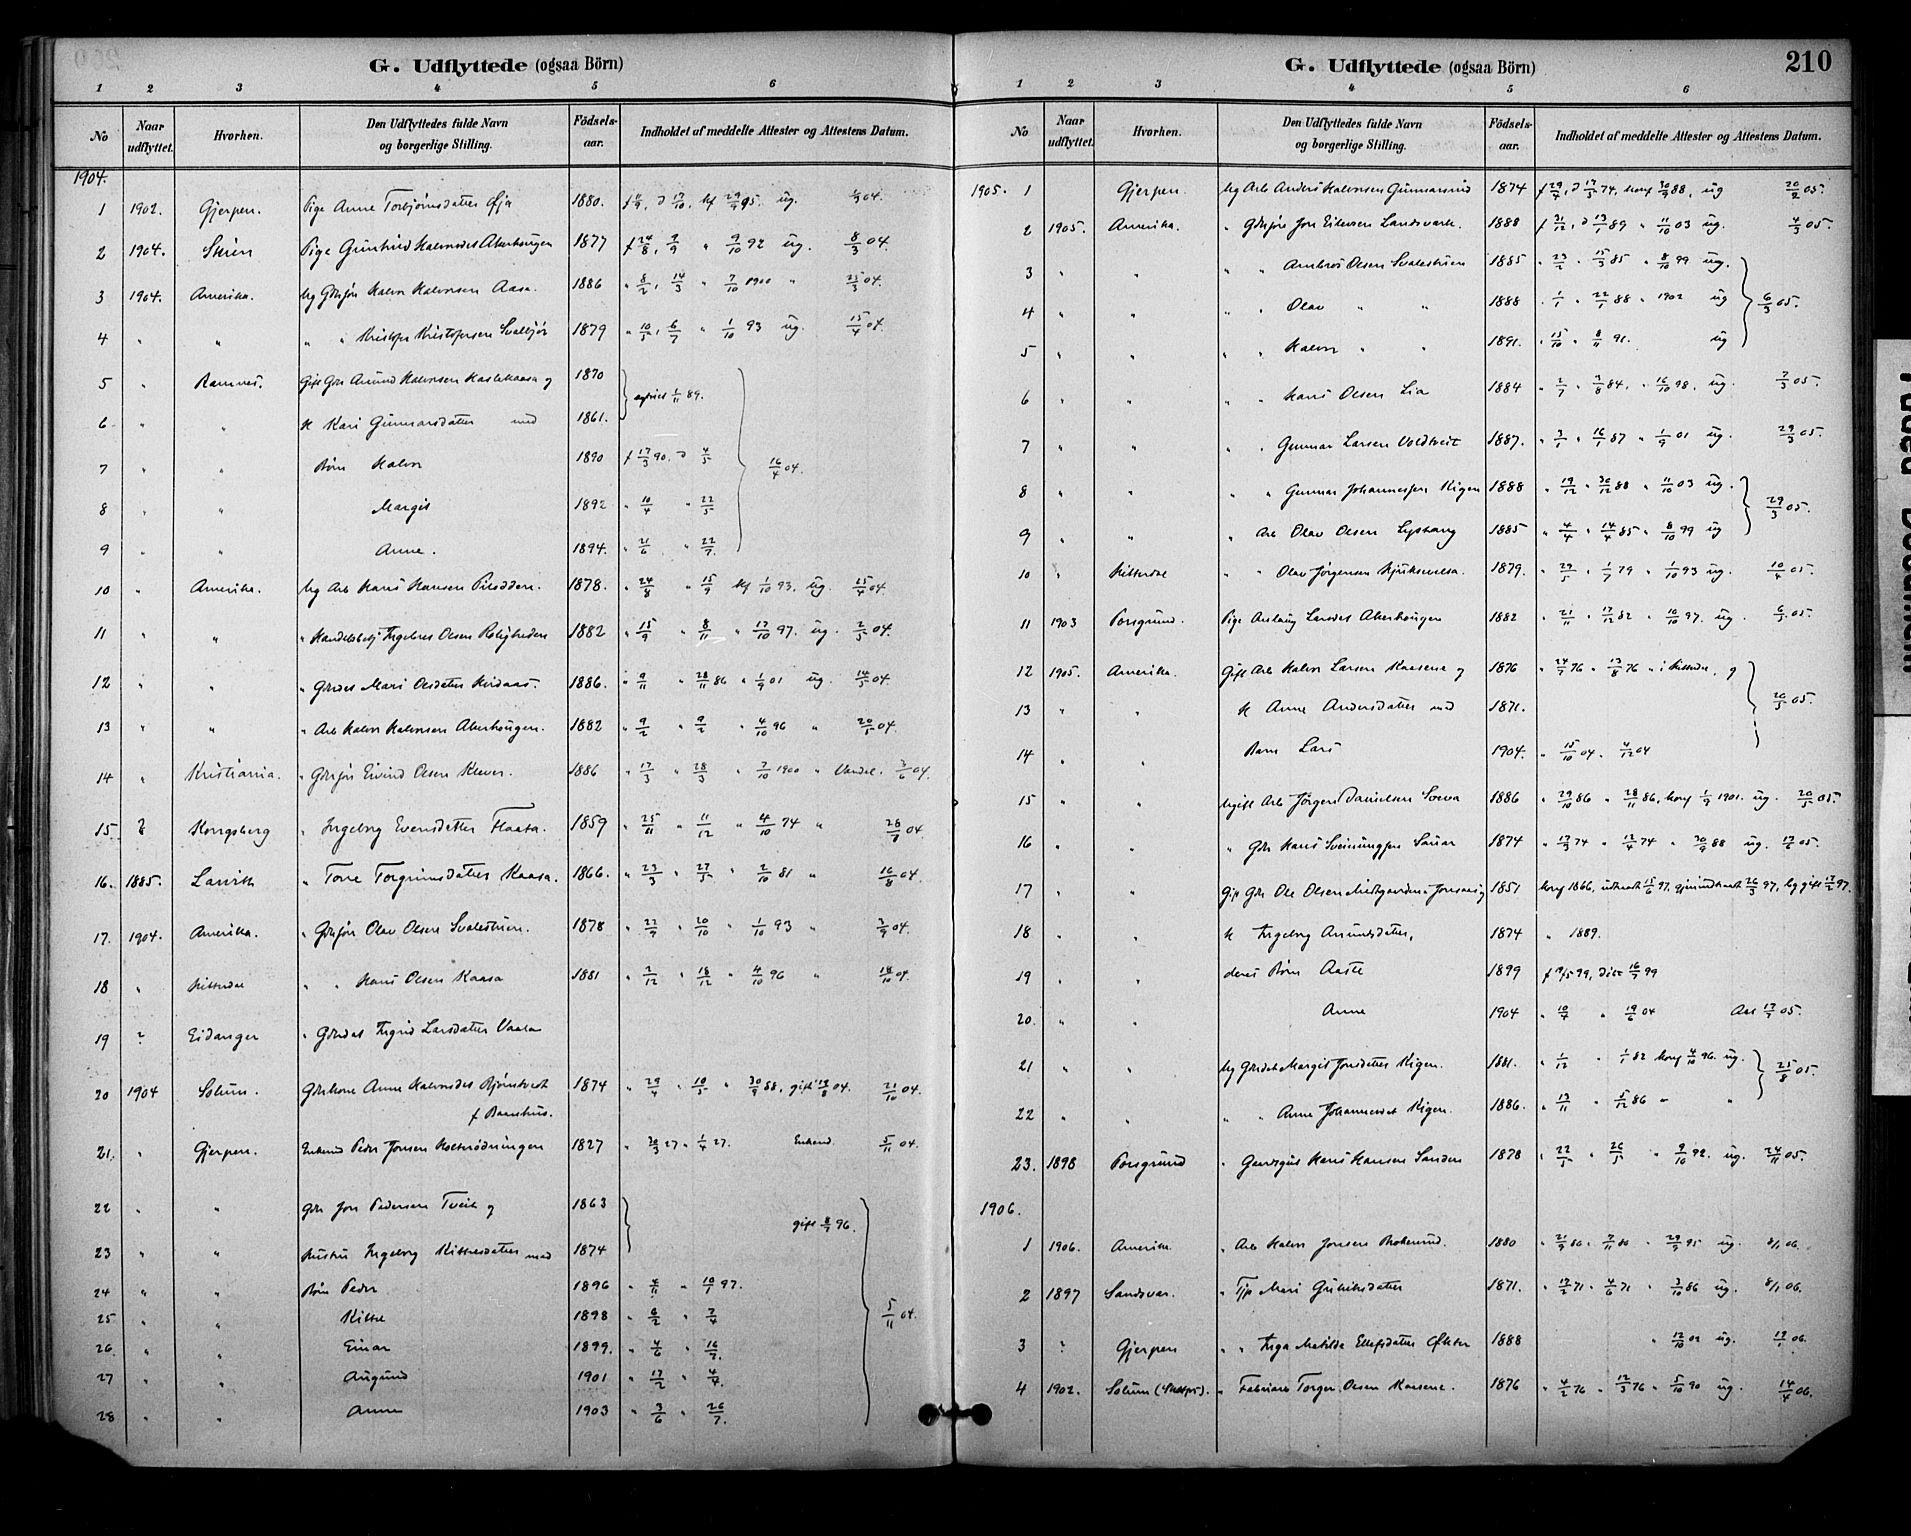 SAKO, Sauherad kirkebøker, F/Fa/L0009: Ministerialbok nr. I 9, 1887-1912, s. 210